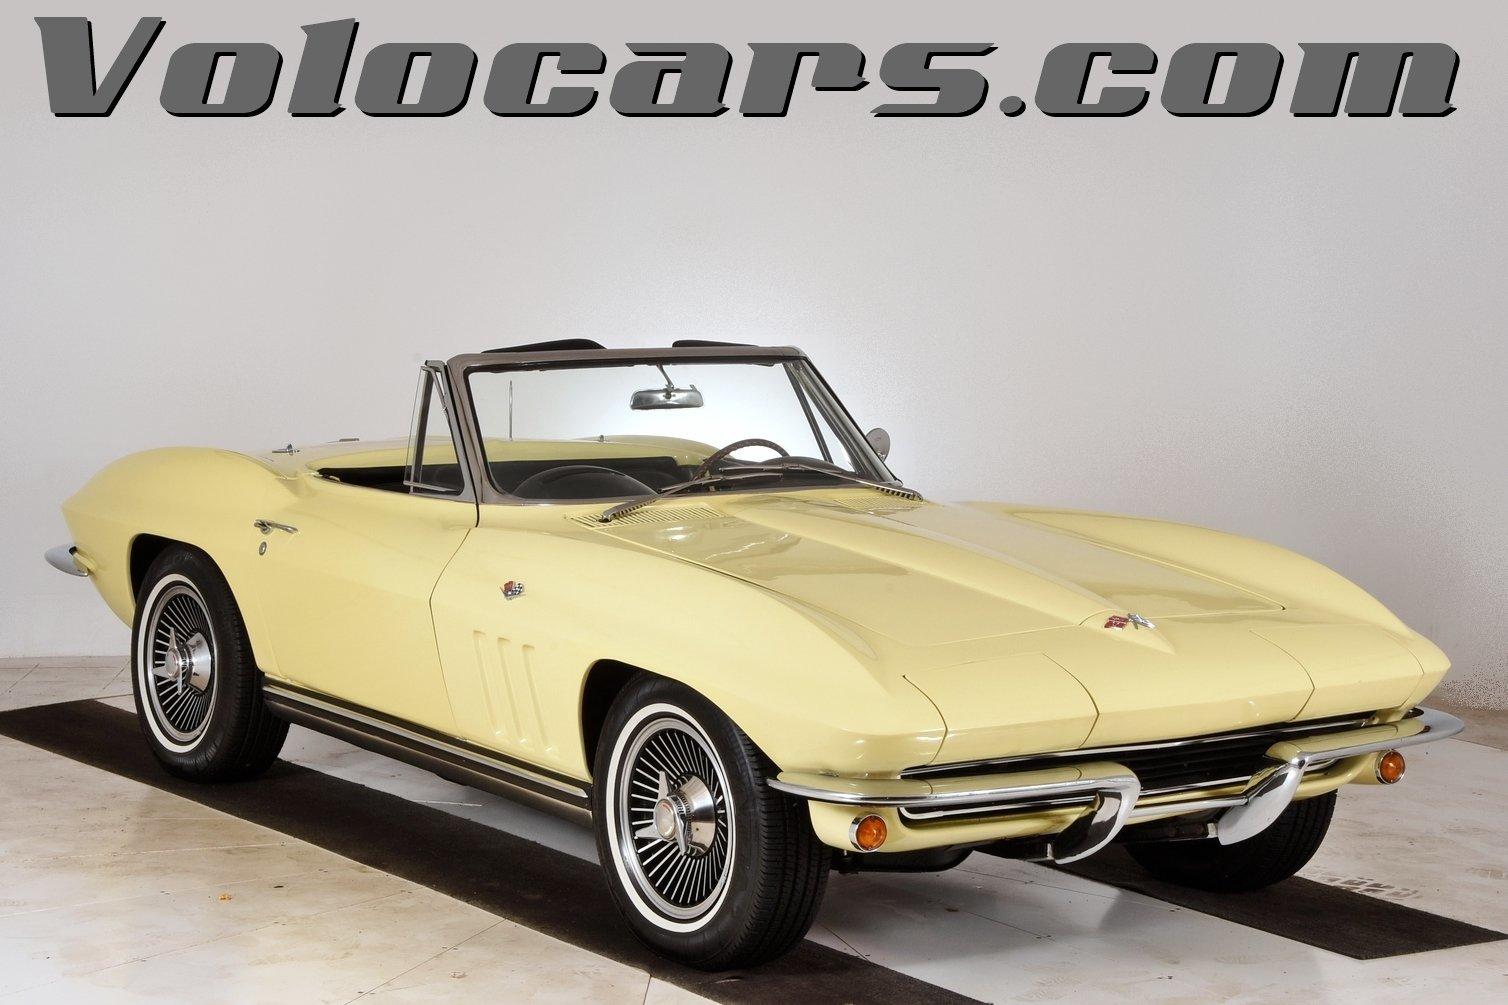 40369503320a93 hd 1965 chevrolet corvette